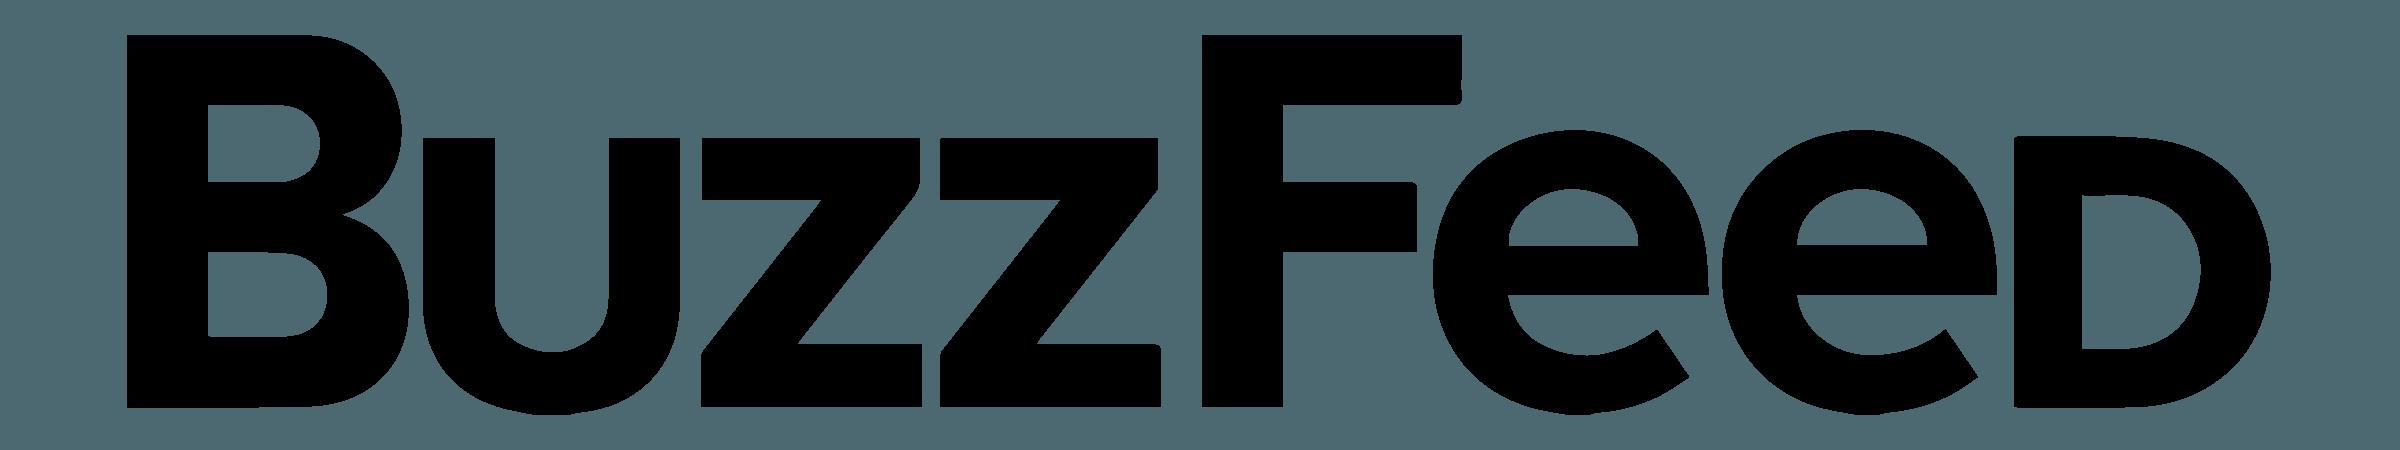 buzzfeed-logo-black-transparent-1